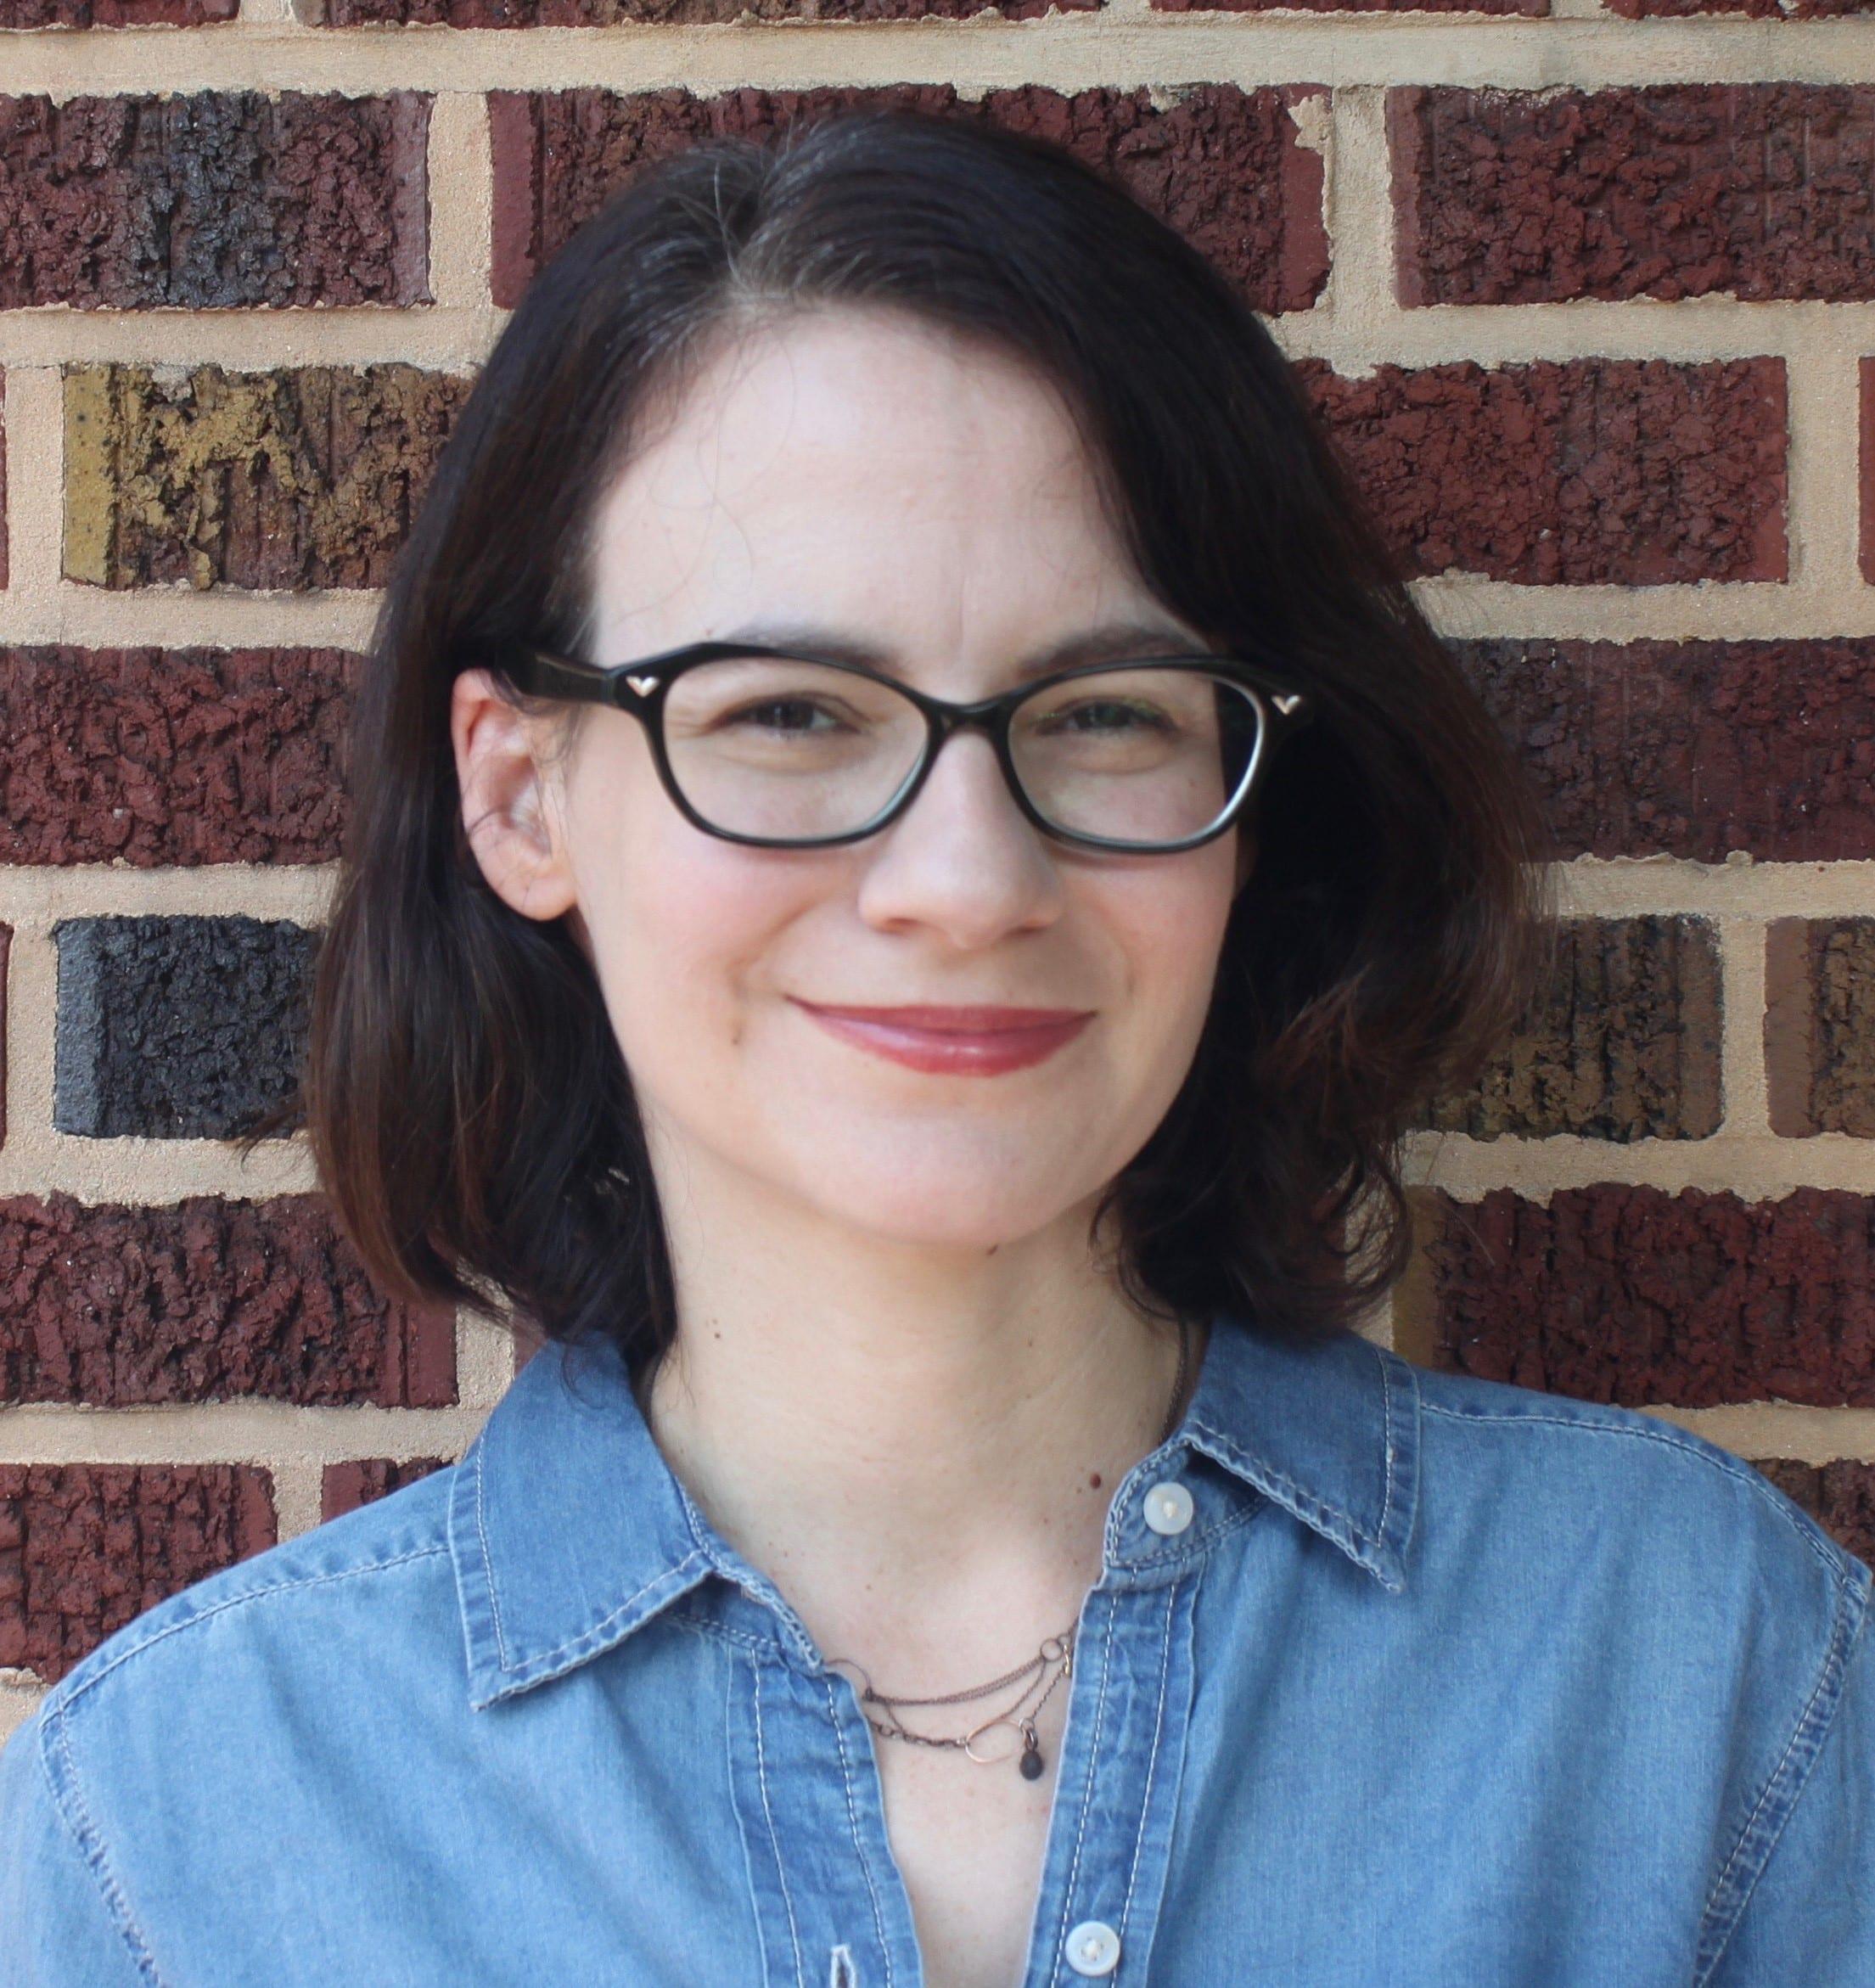 Amy Balanoff